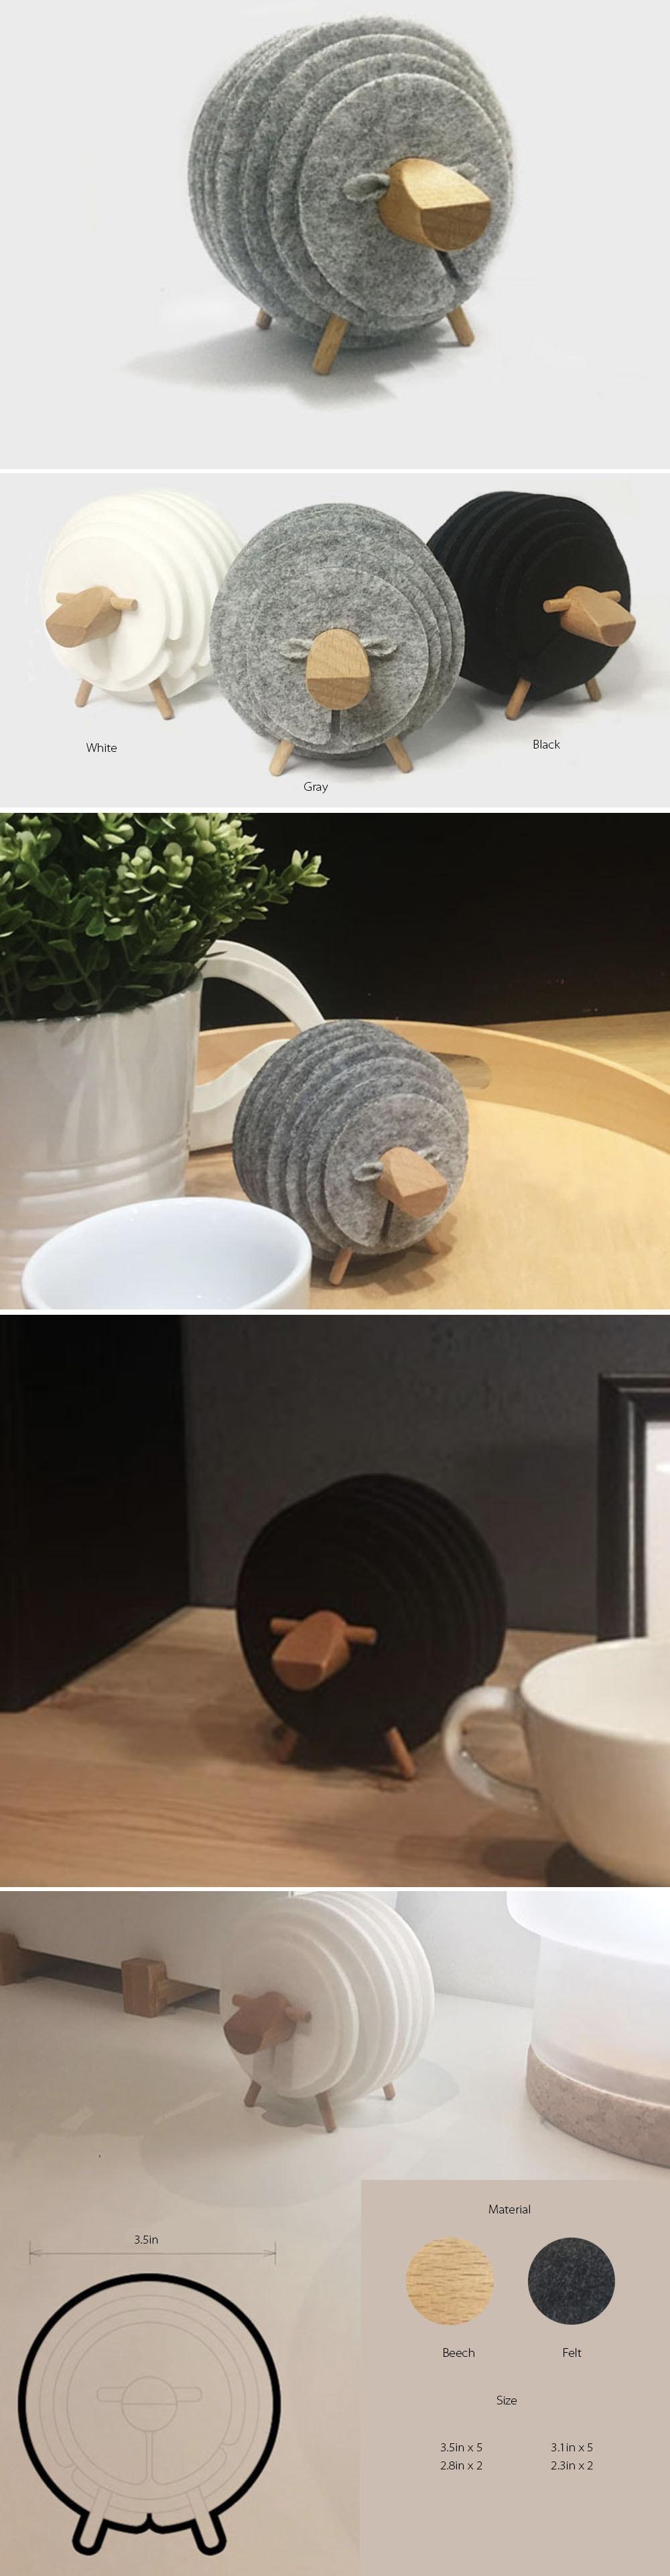 Sheep Coasters Japanese and Cute Design